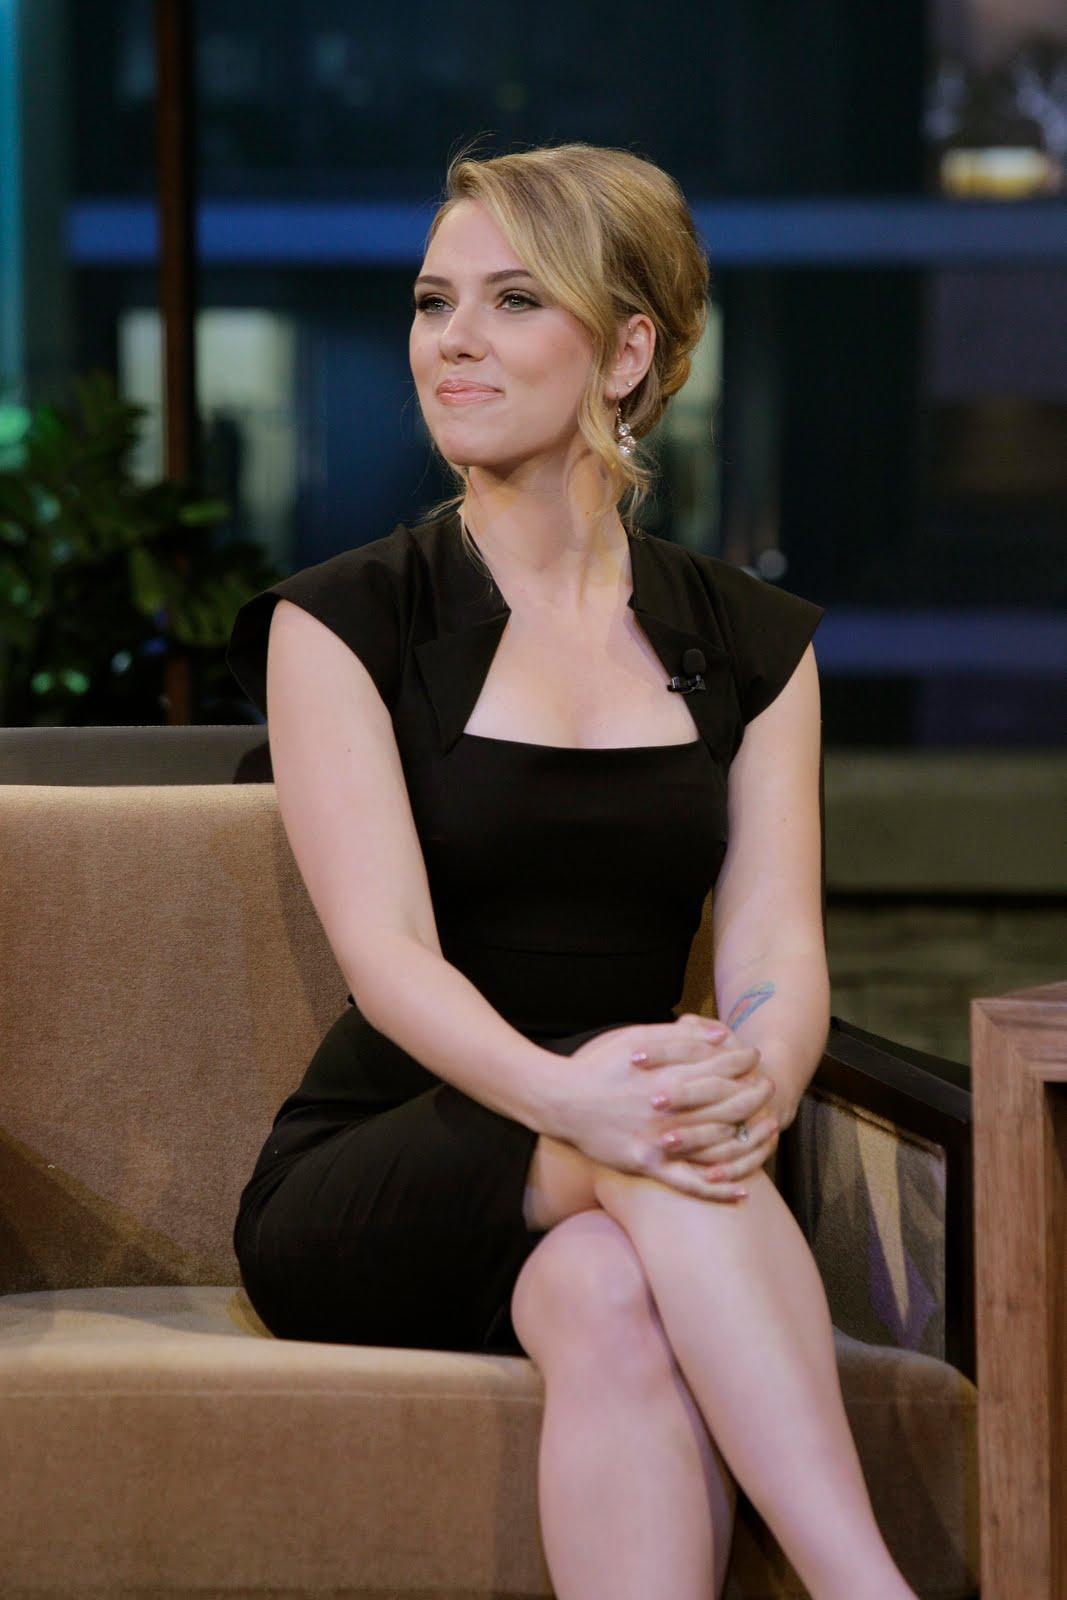 http://4.bp.blogspot.com/_te_-NCYOffc/S-Nf1q00IMI/AAAAAAAABlk/B03oyiQquUU/s1600/sexy_Scarlett_Johansson_3.jpg